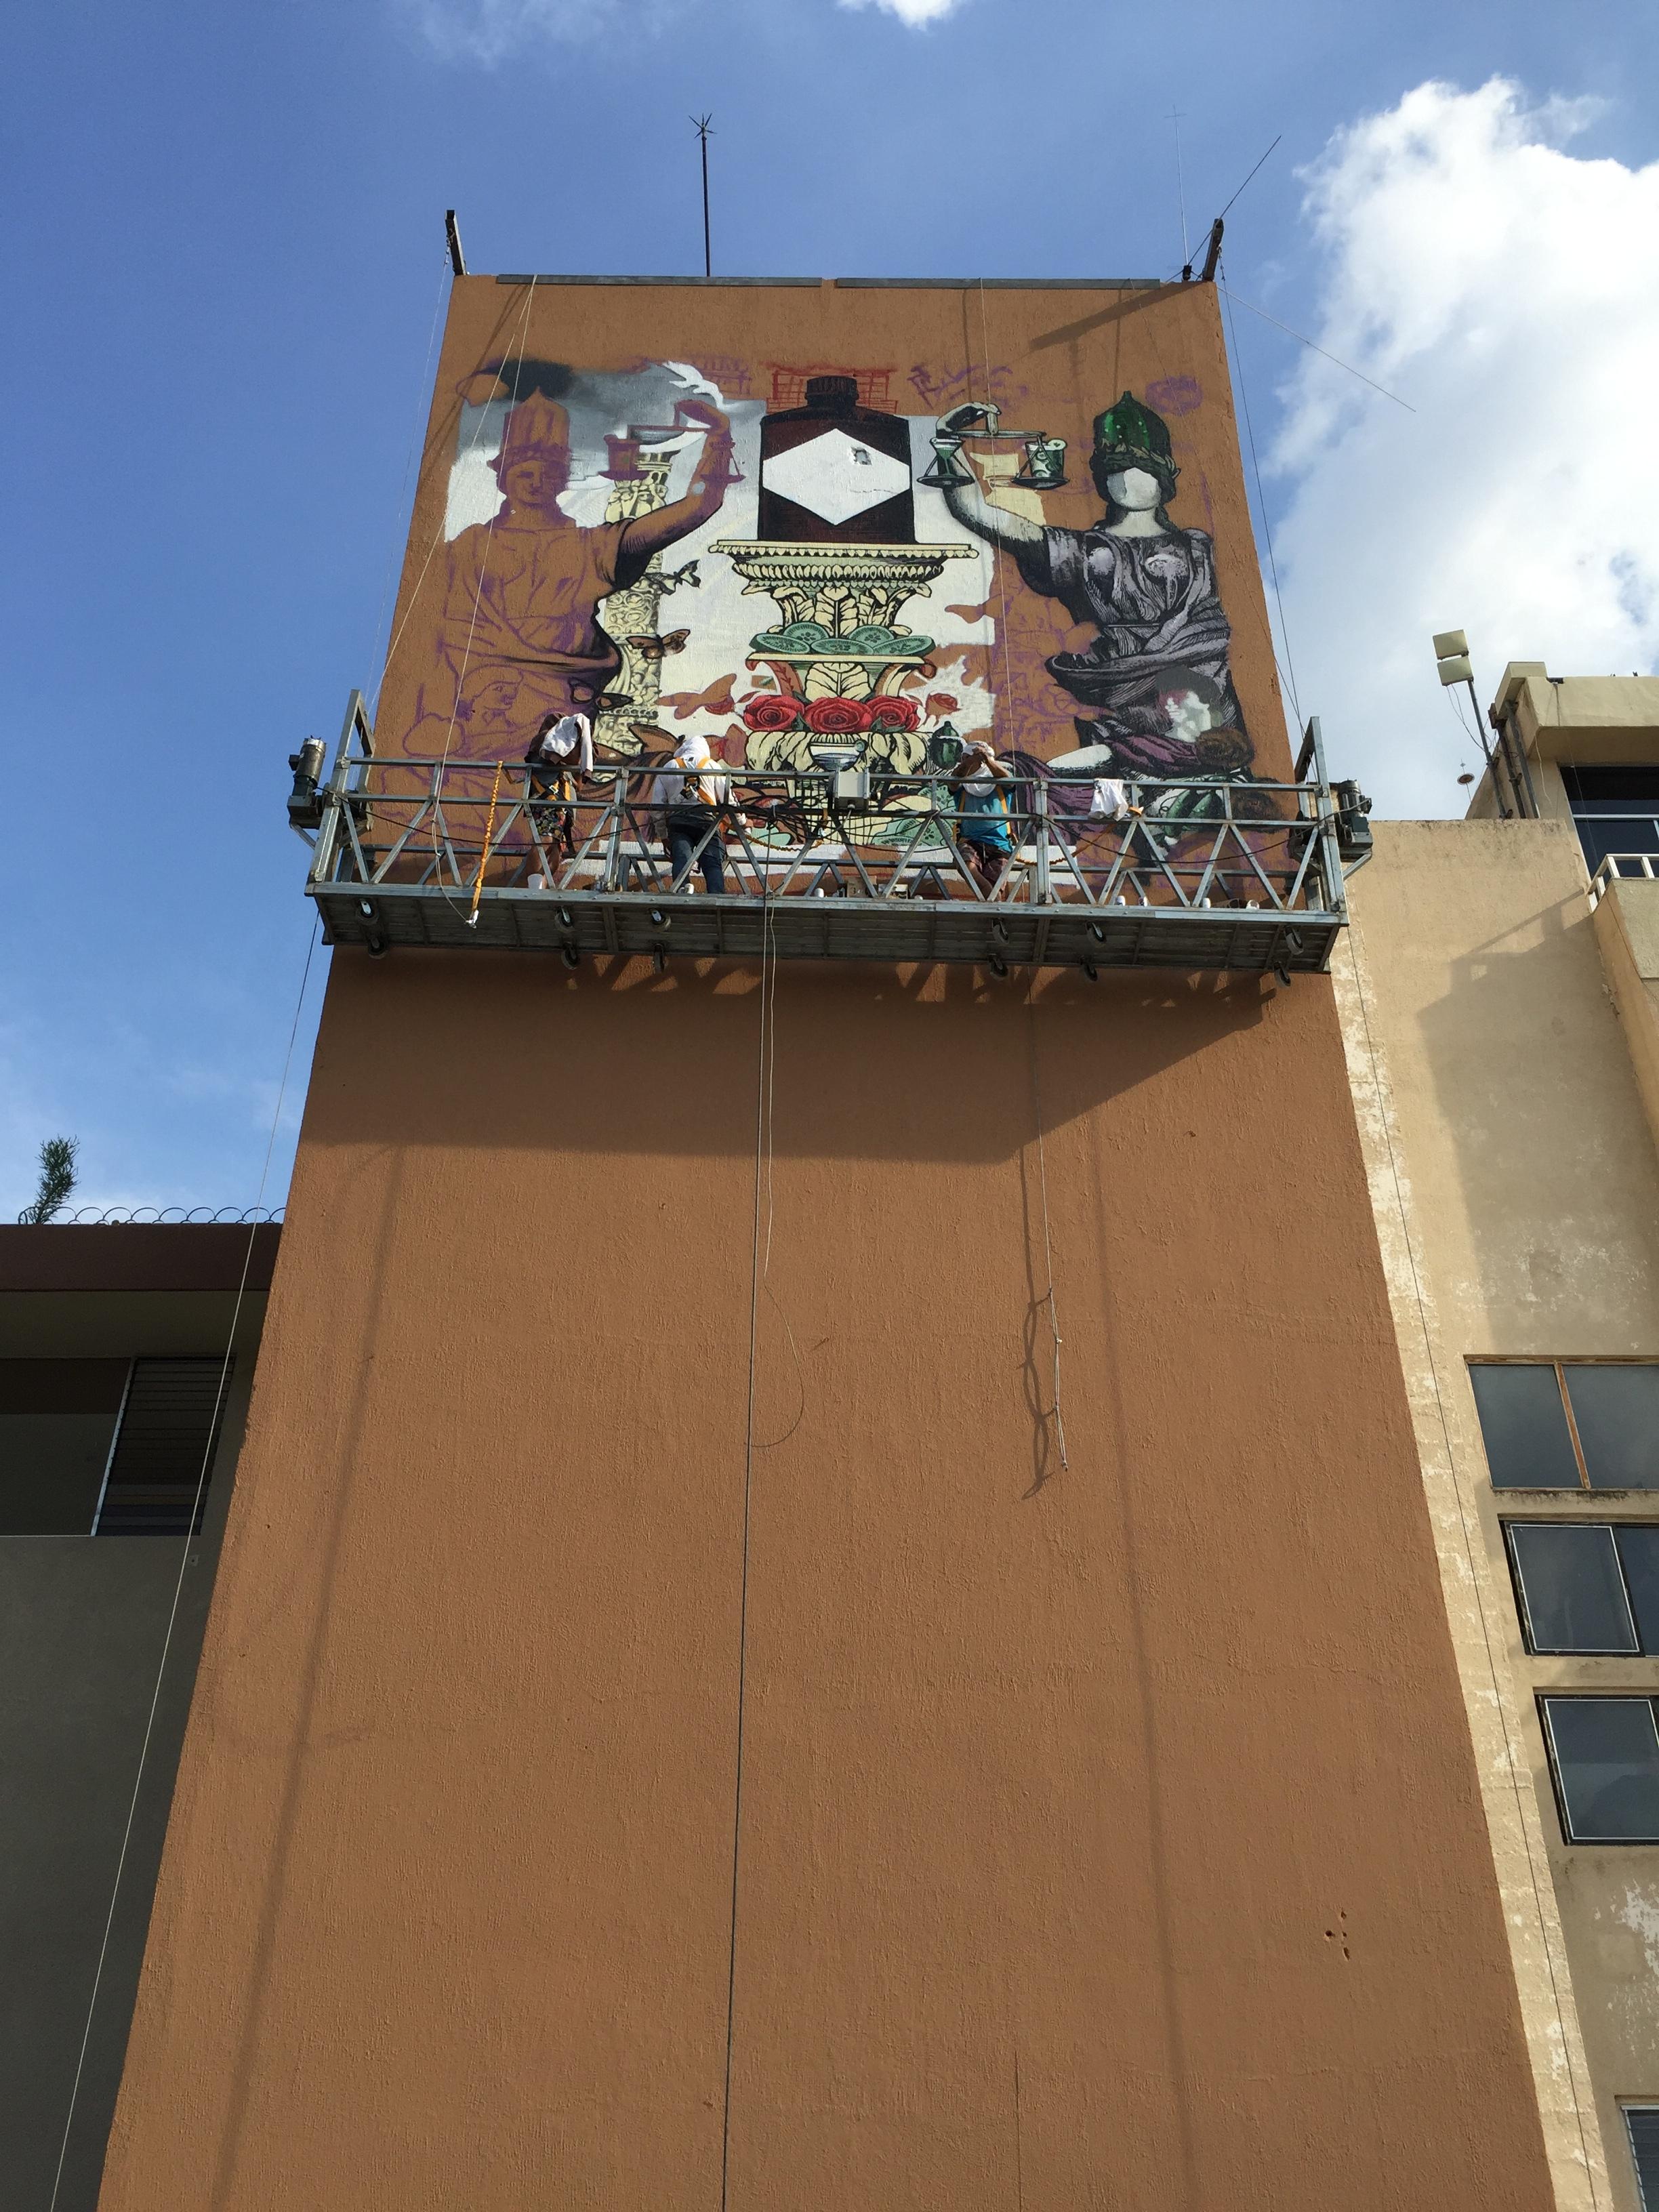 Painted Billboards : painted, billboards, Hendrick's, Hand-painted, Billboards, Studio